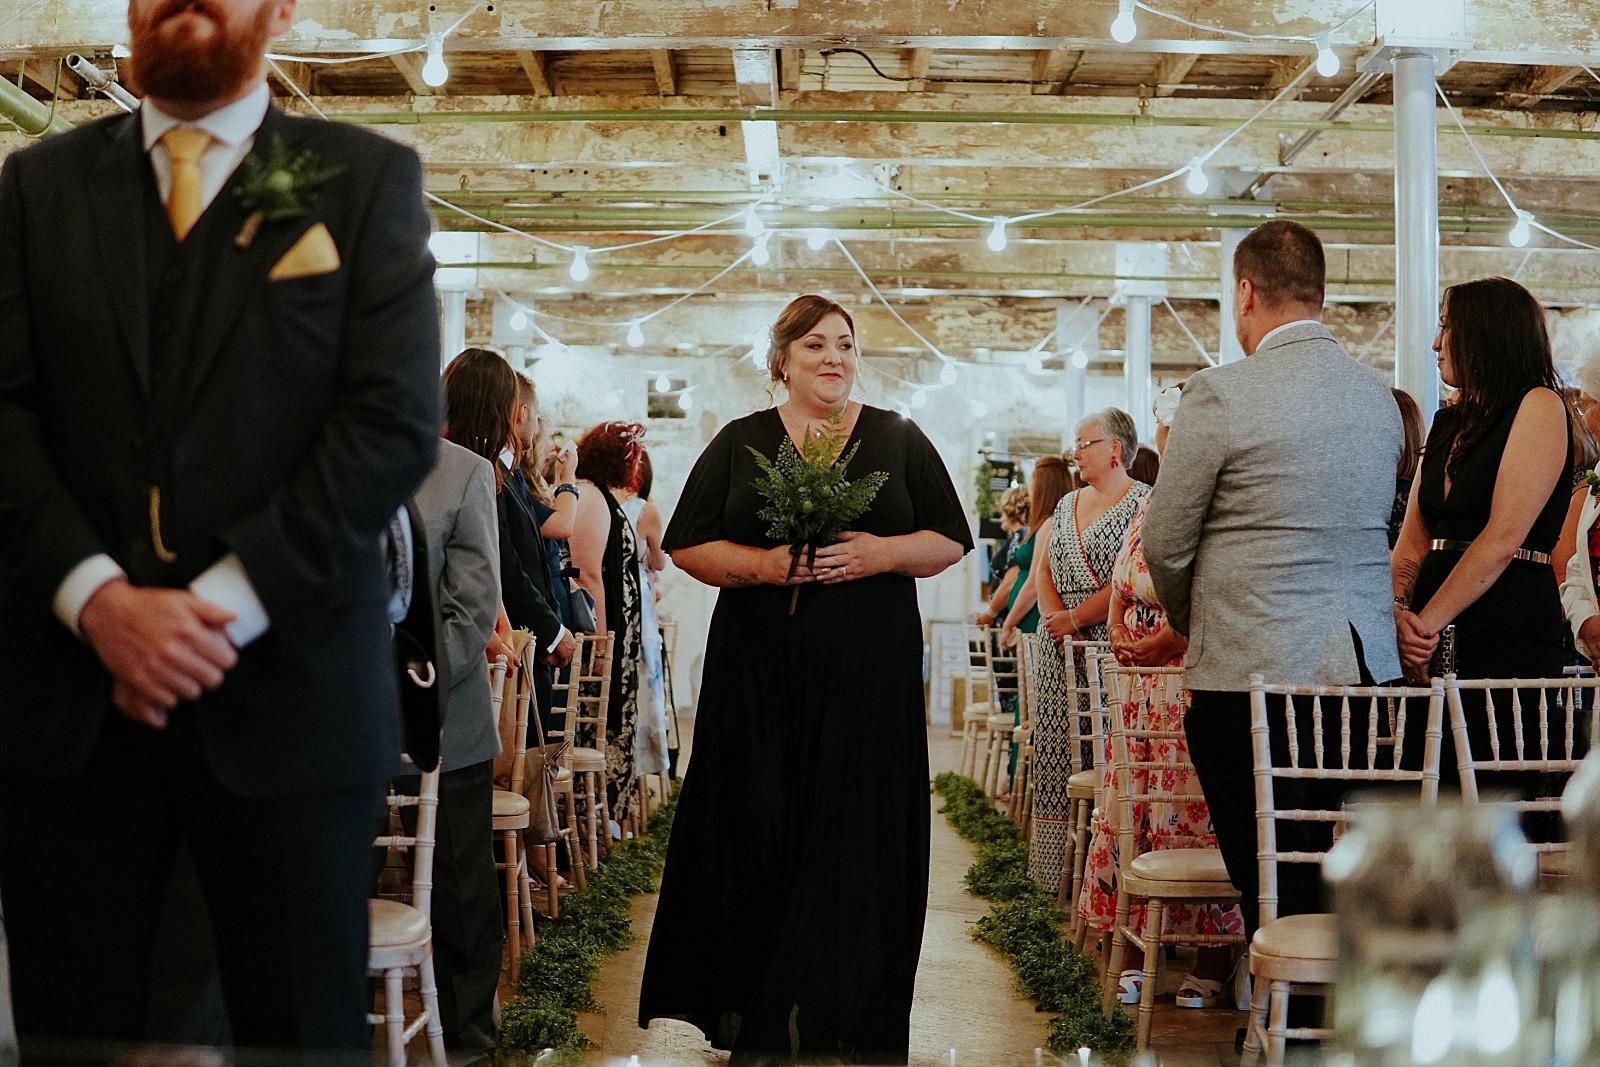 brides sister in black bridesmaids dress